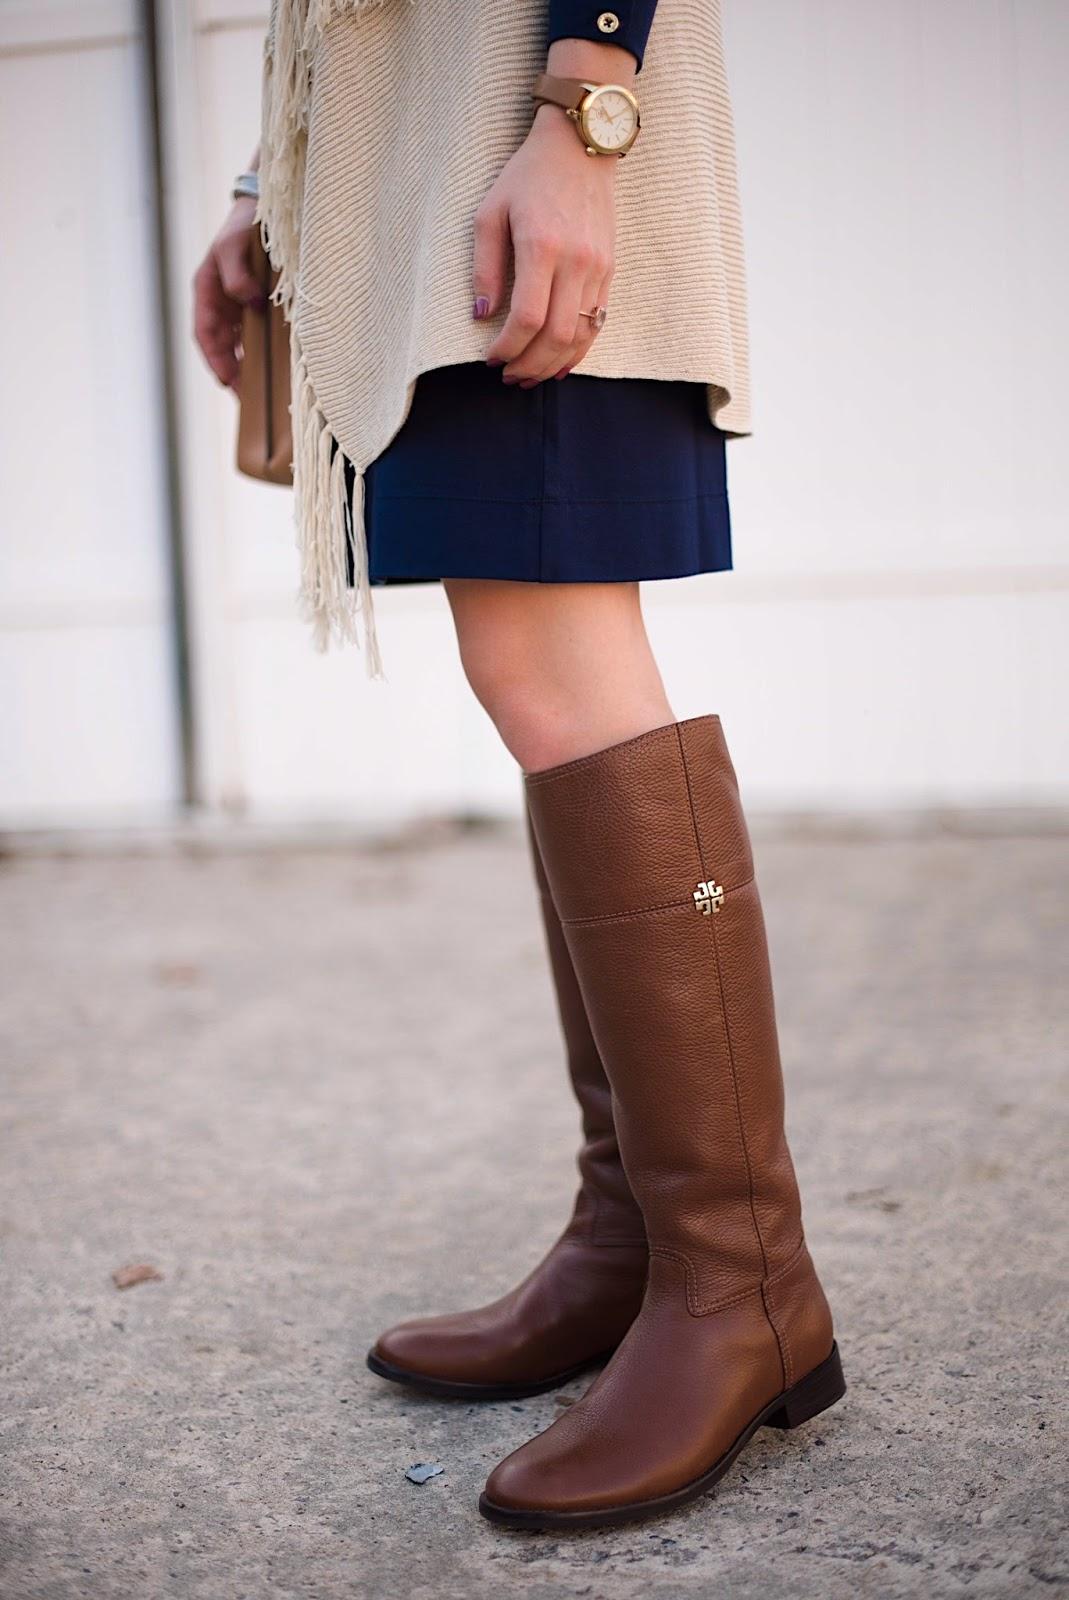 Tory Burch Riding Boots - Rachel Timmerman of Something Delightful Blog